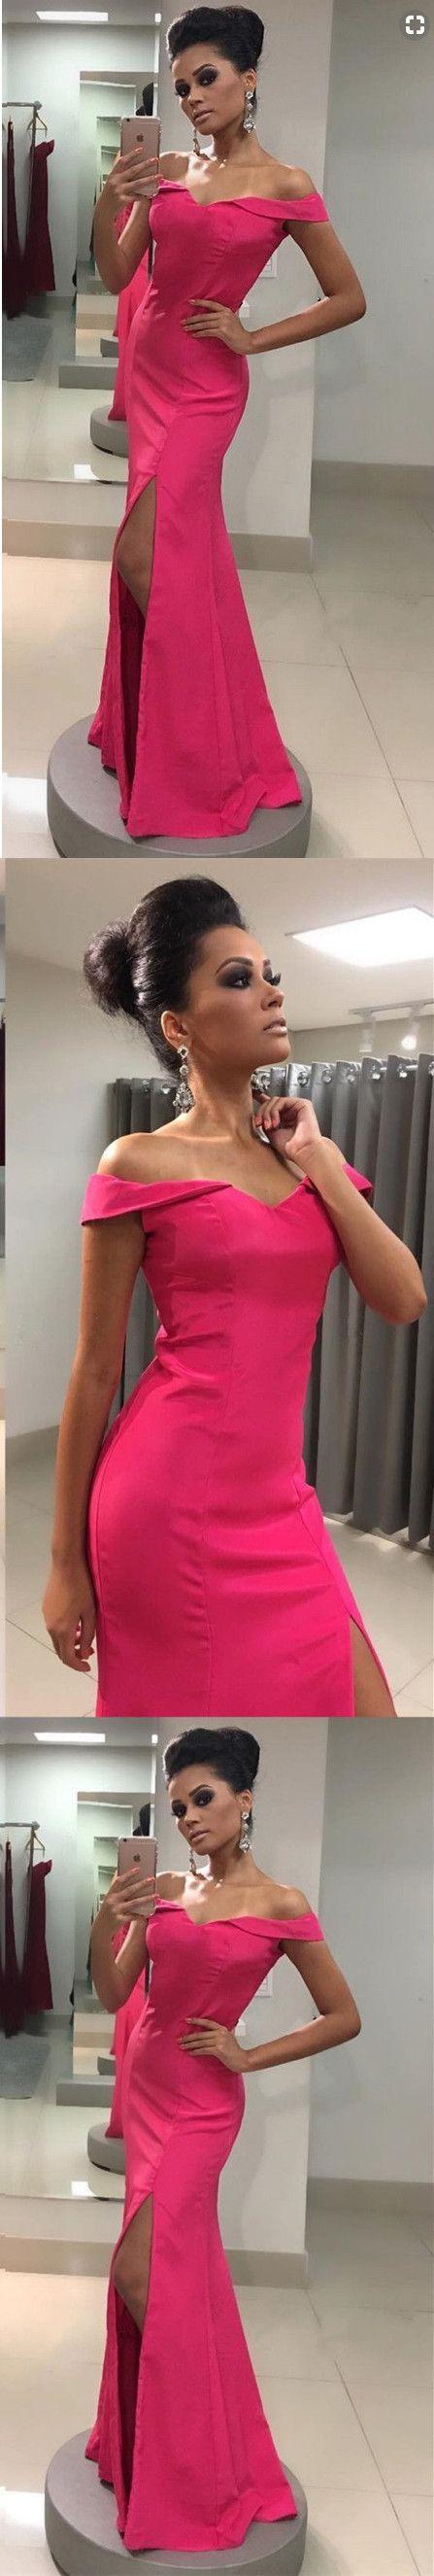 Off shoulder mermaid prom dress sexy split slit prom dresses